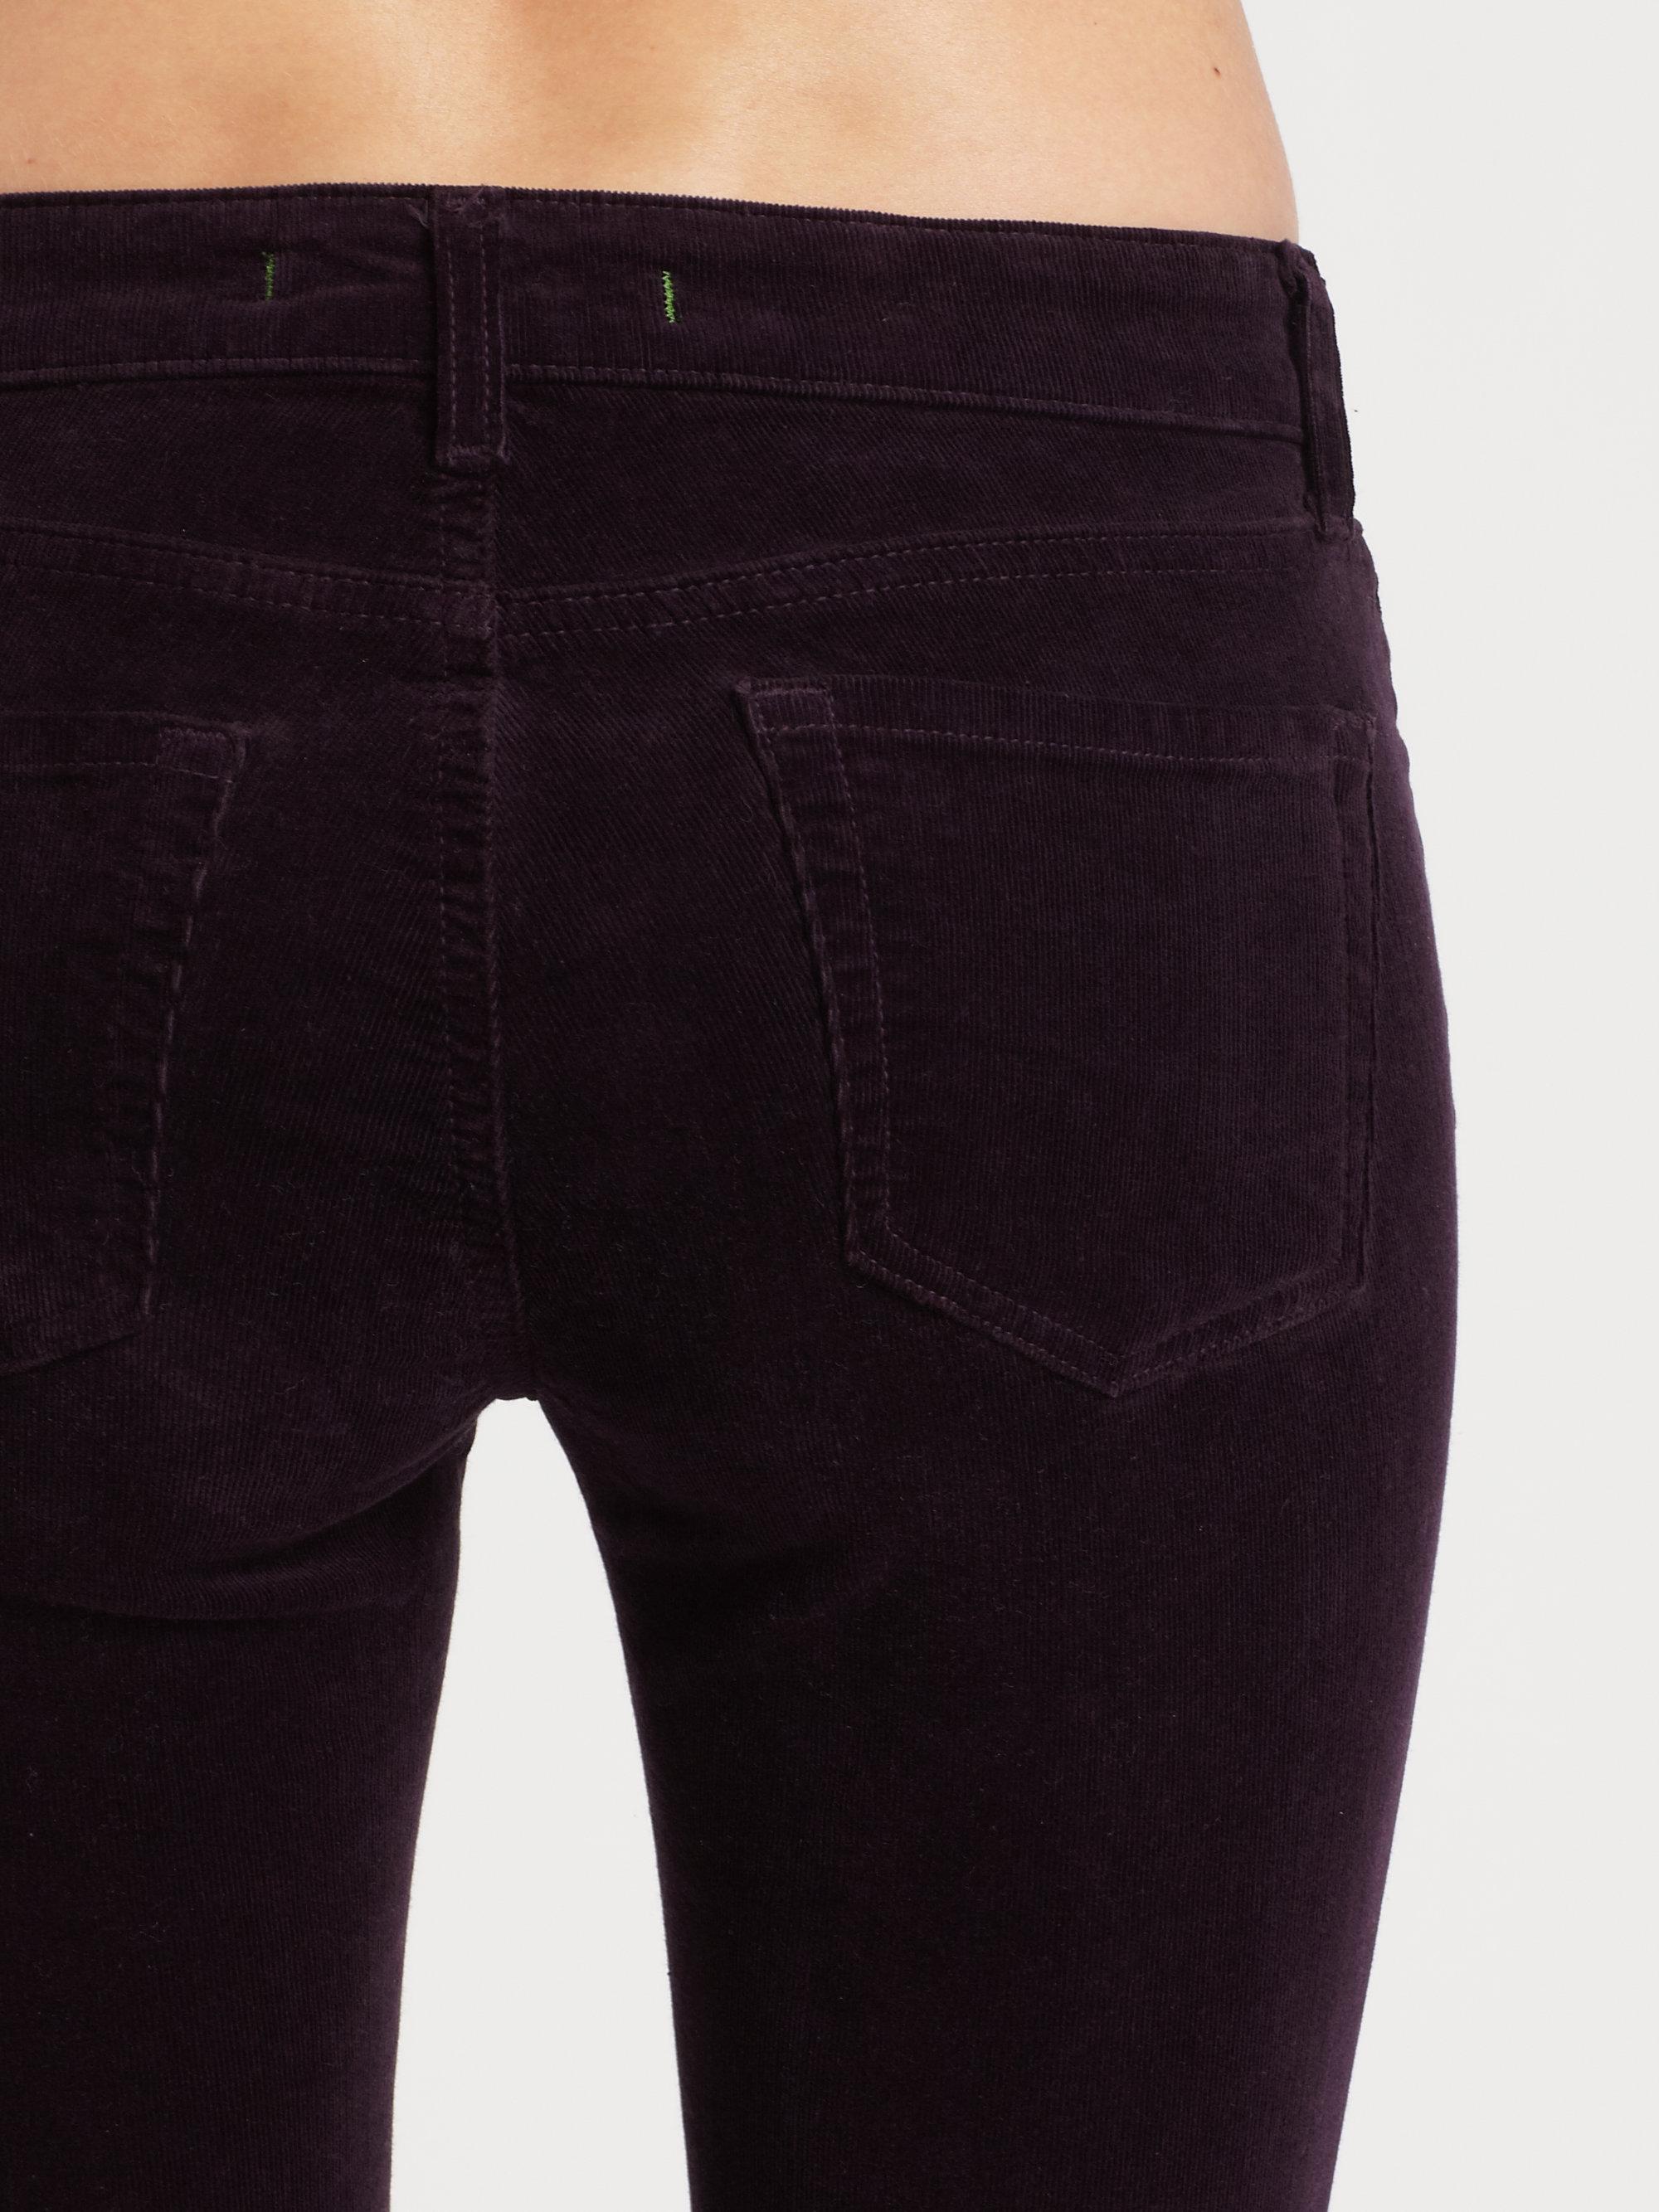 J brand Lowrise Corduroy Skinny Jeans in Black   Lyst